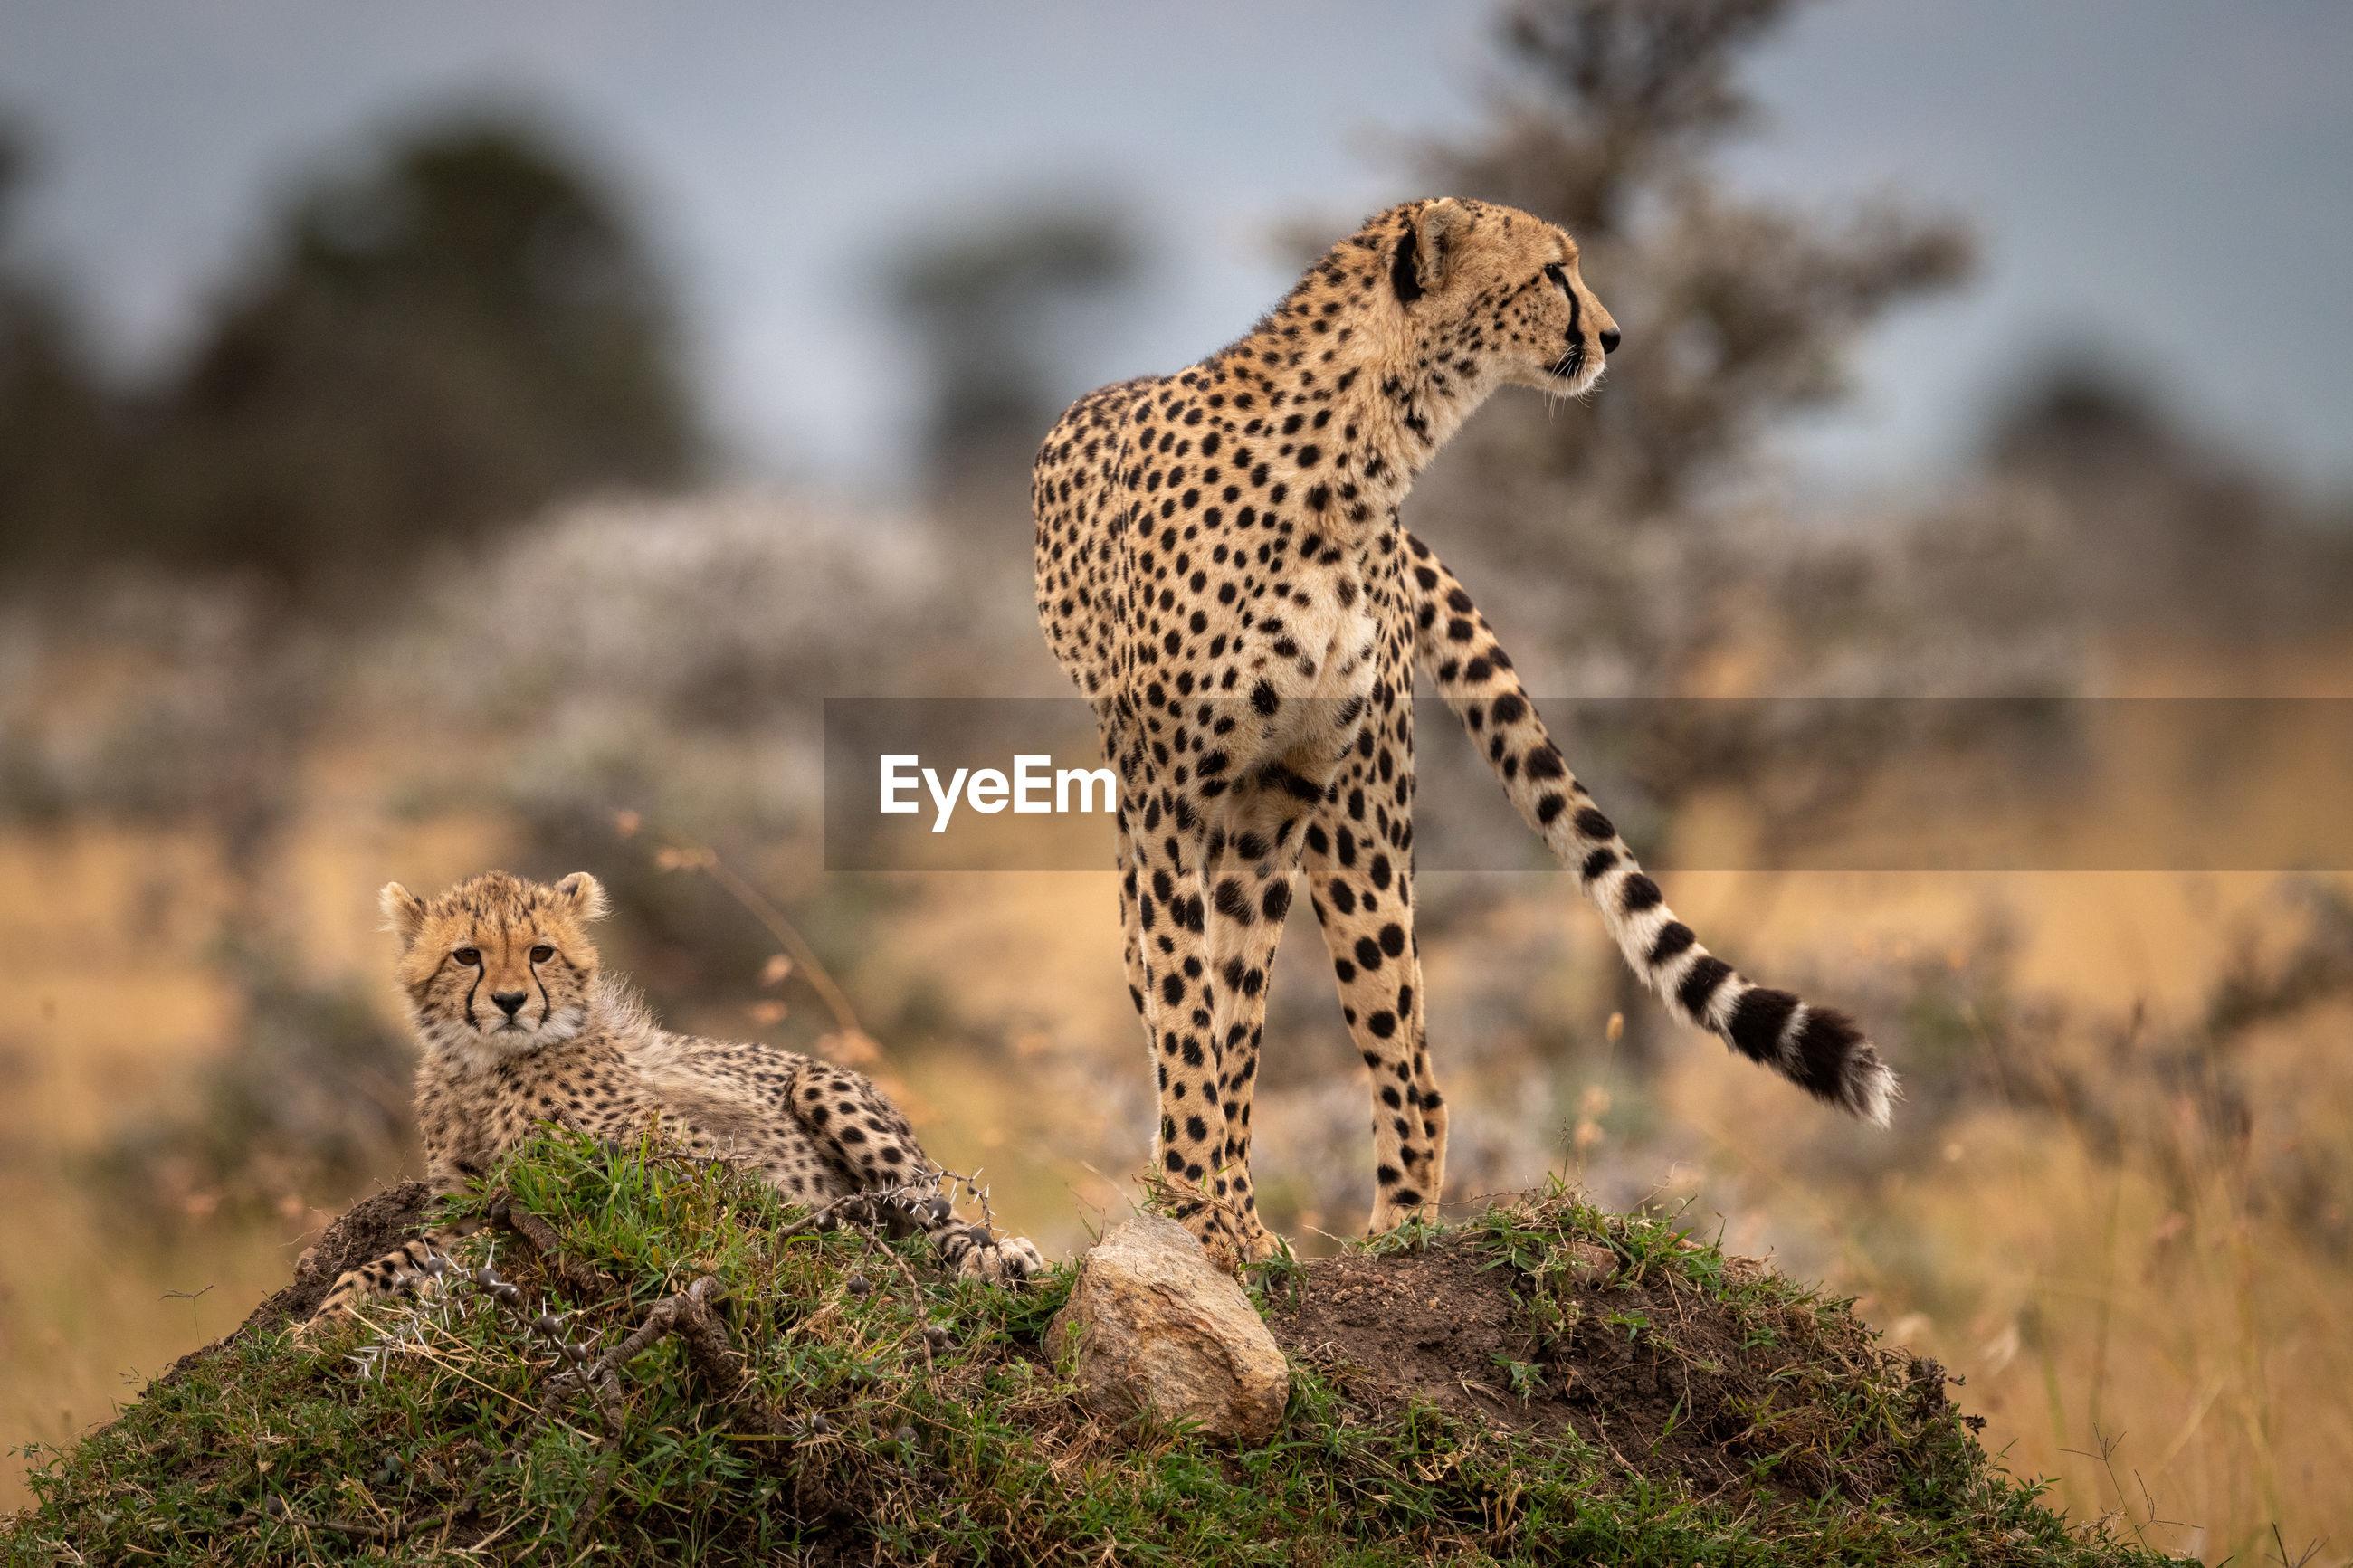 Cheetah family on grassy field